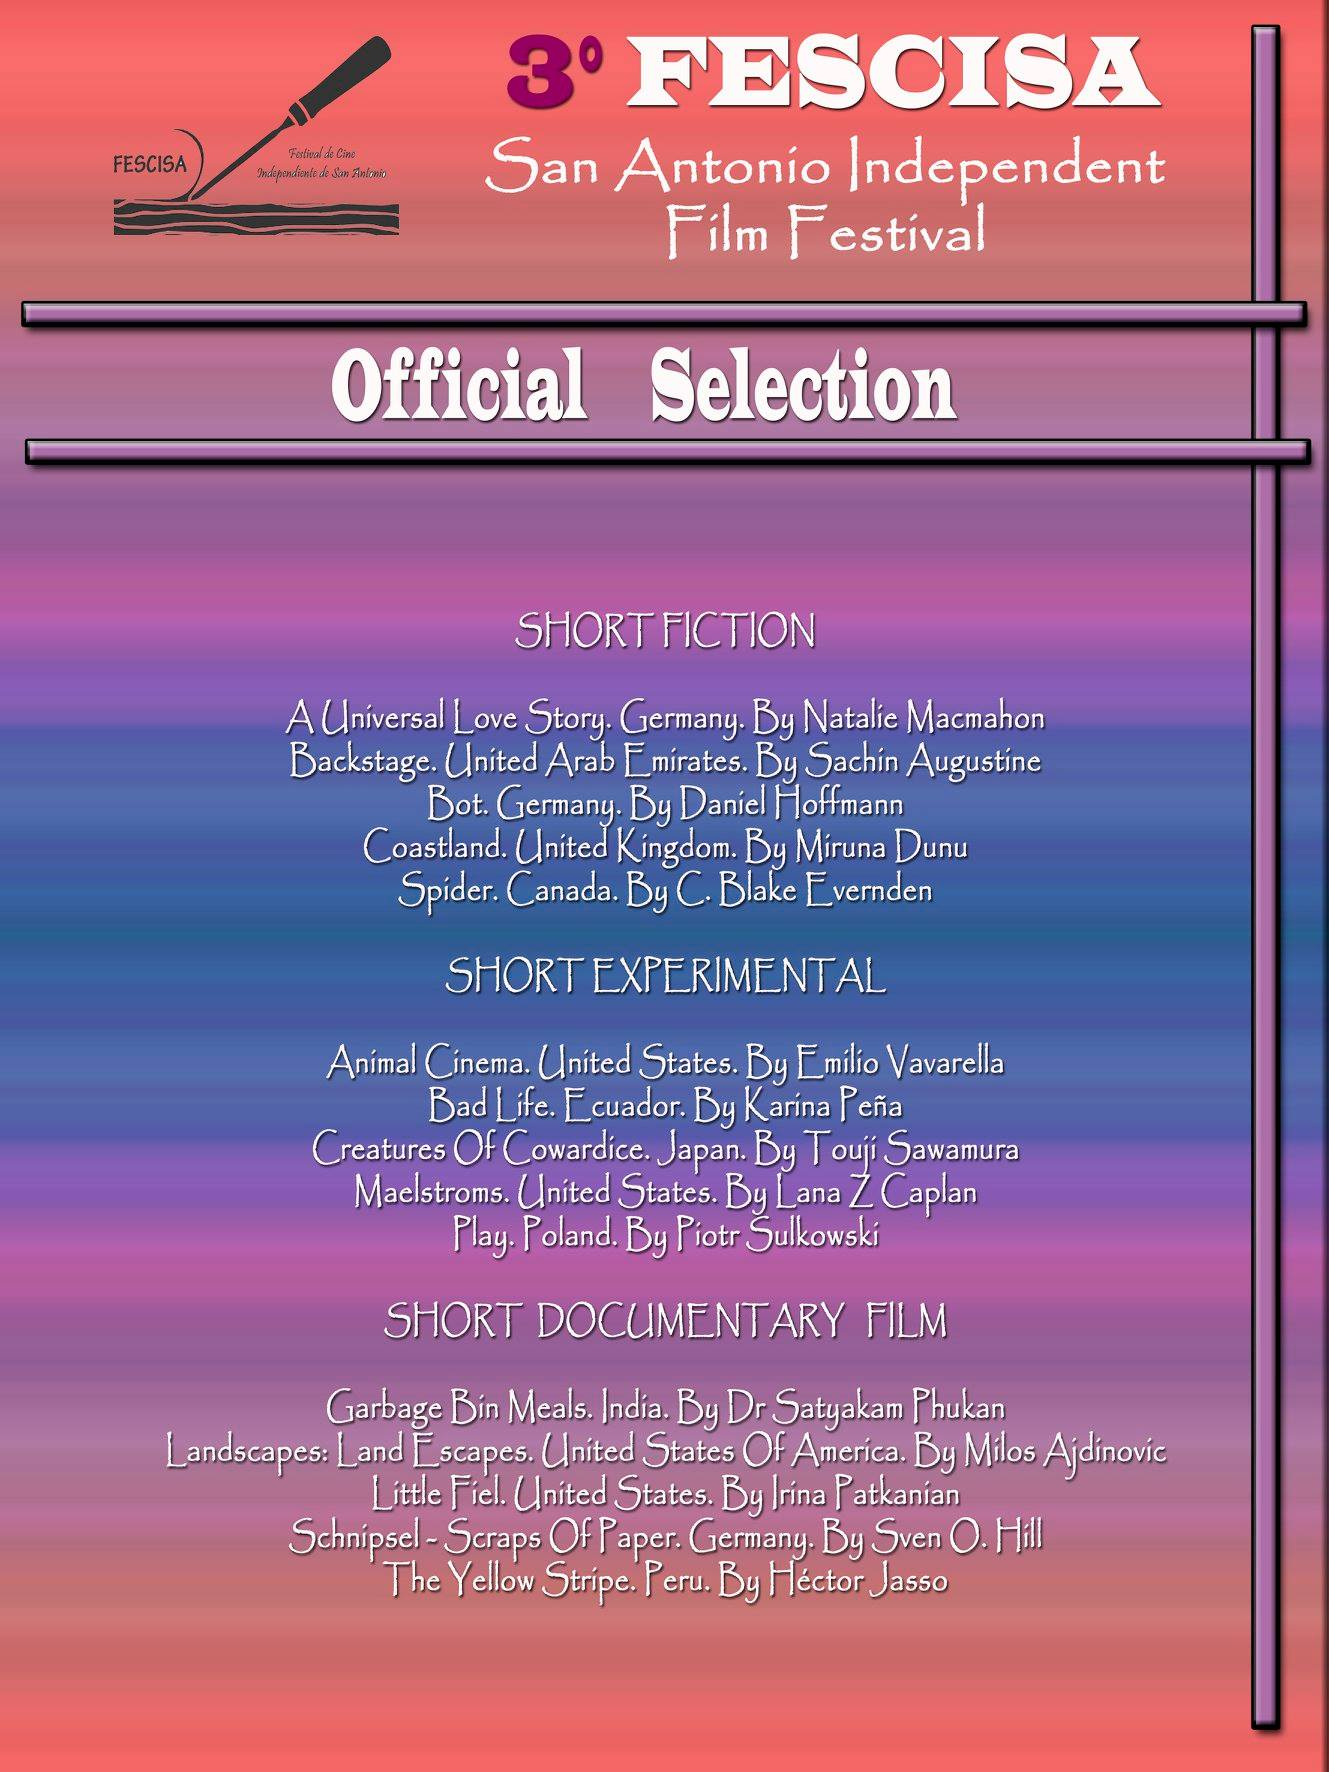 san_antonio_festival_official_selection.jpg